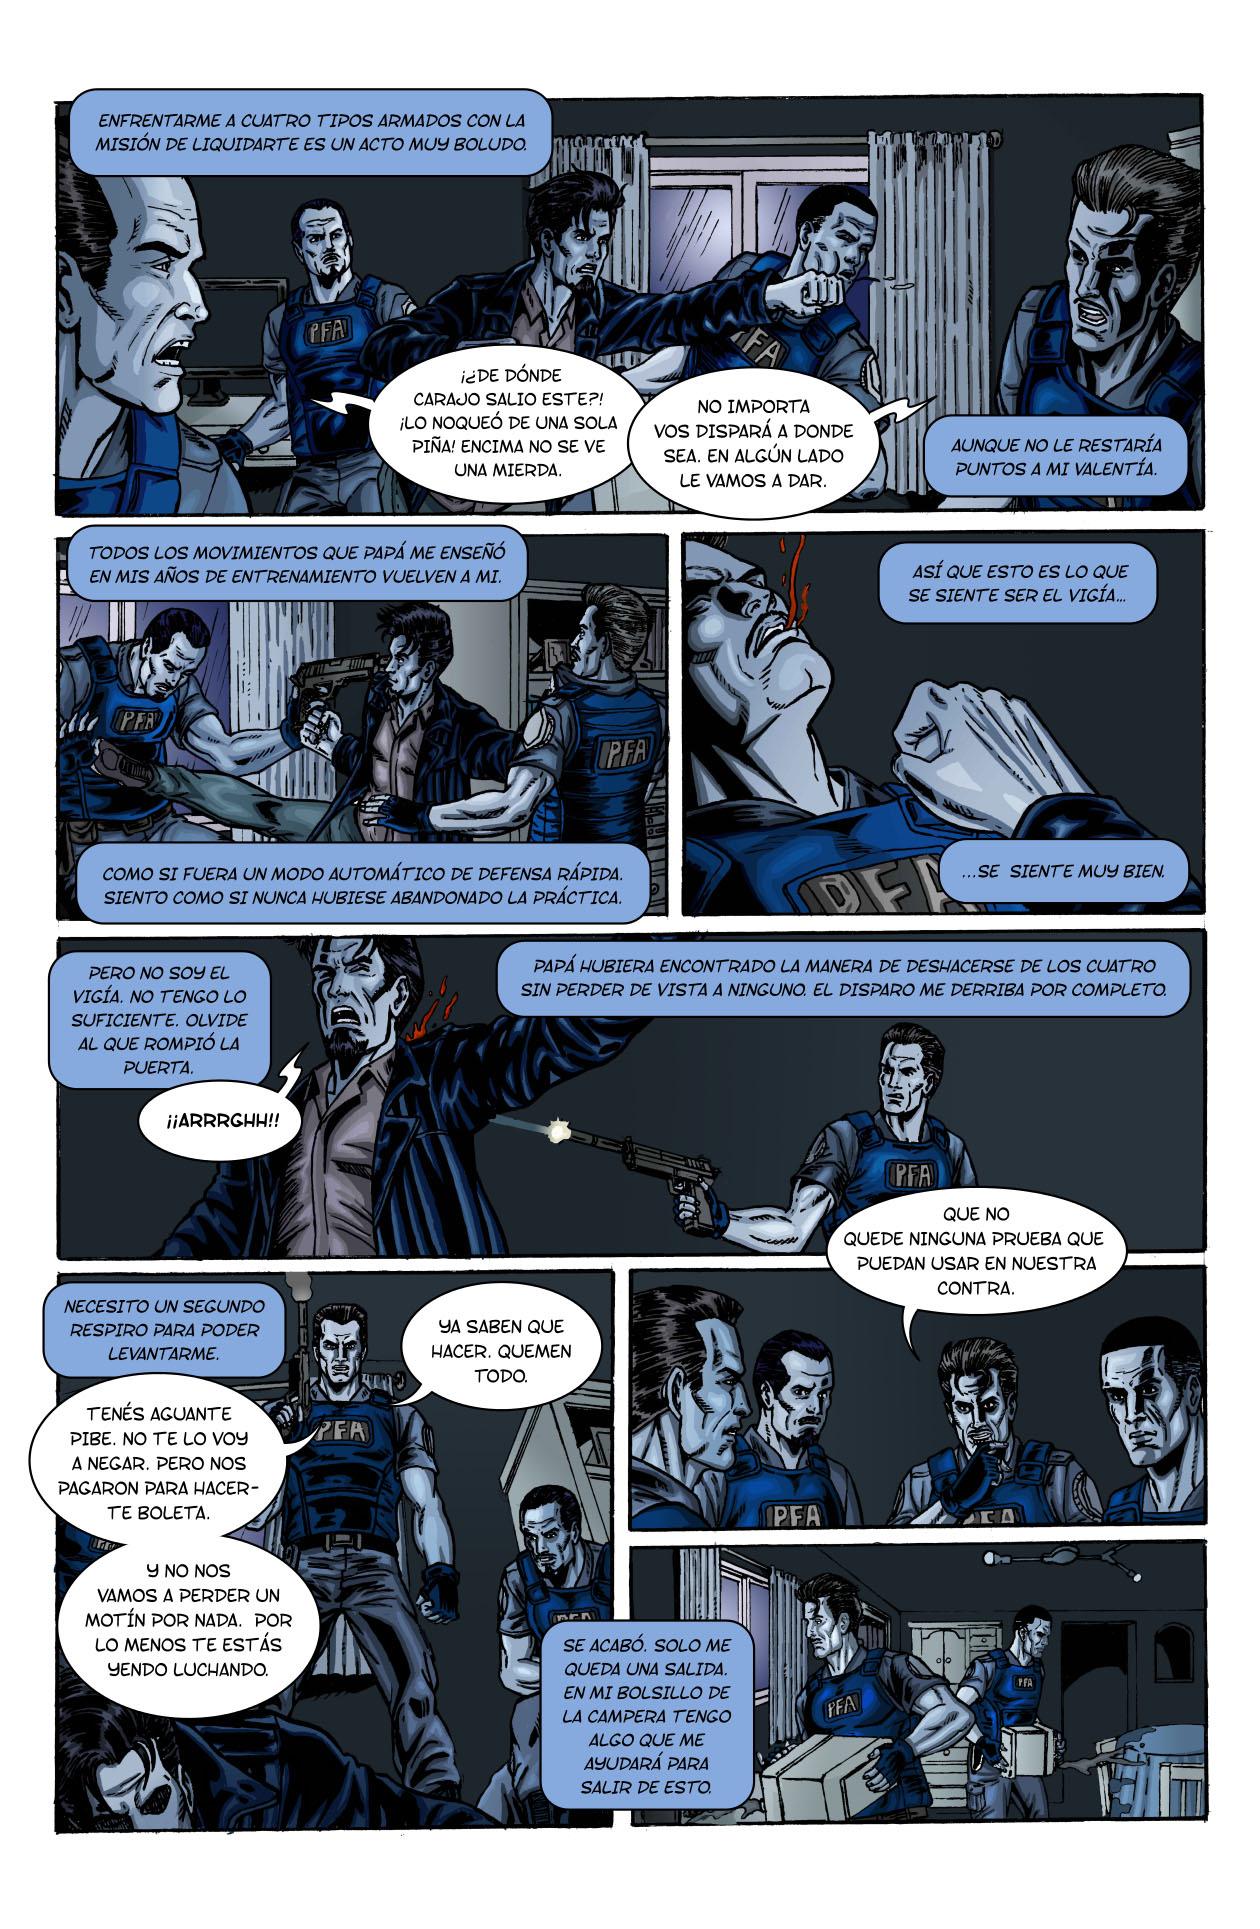 ElVigia-issue-01-page-22